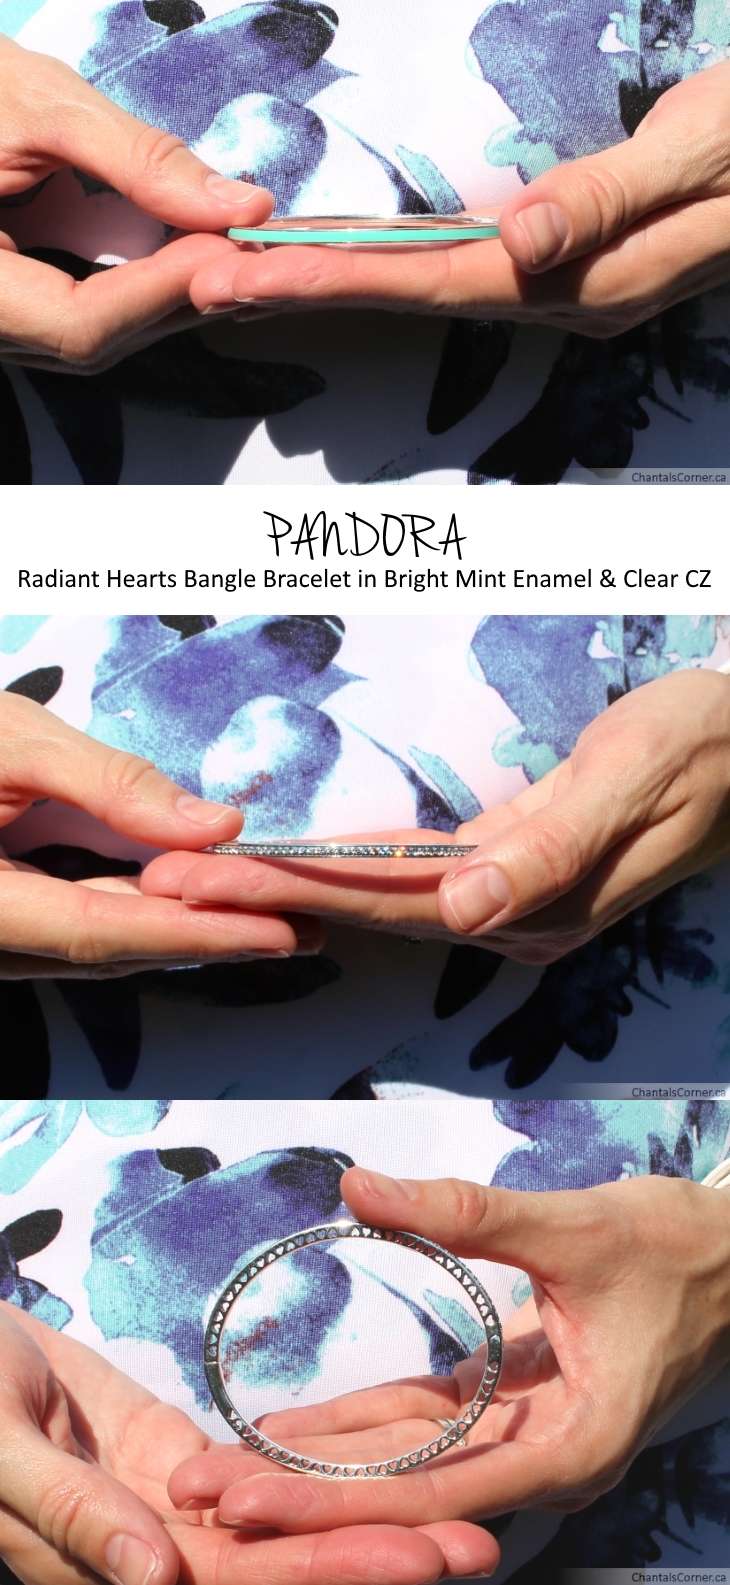 Radiant Hearts of PANDORA Bright Mint Enamel & Clear CZ bangle bracelet